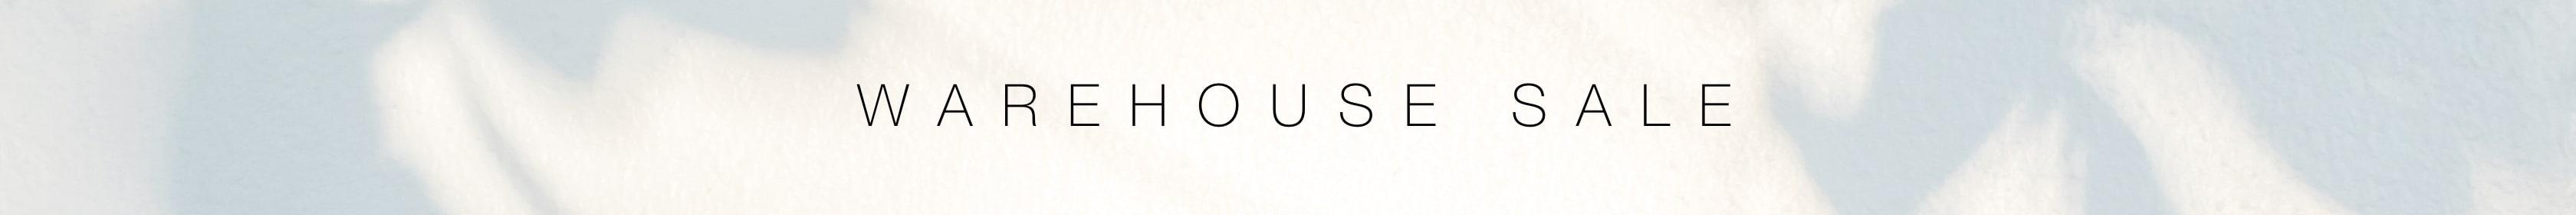 Shop the Arhaus Warehouse Sale